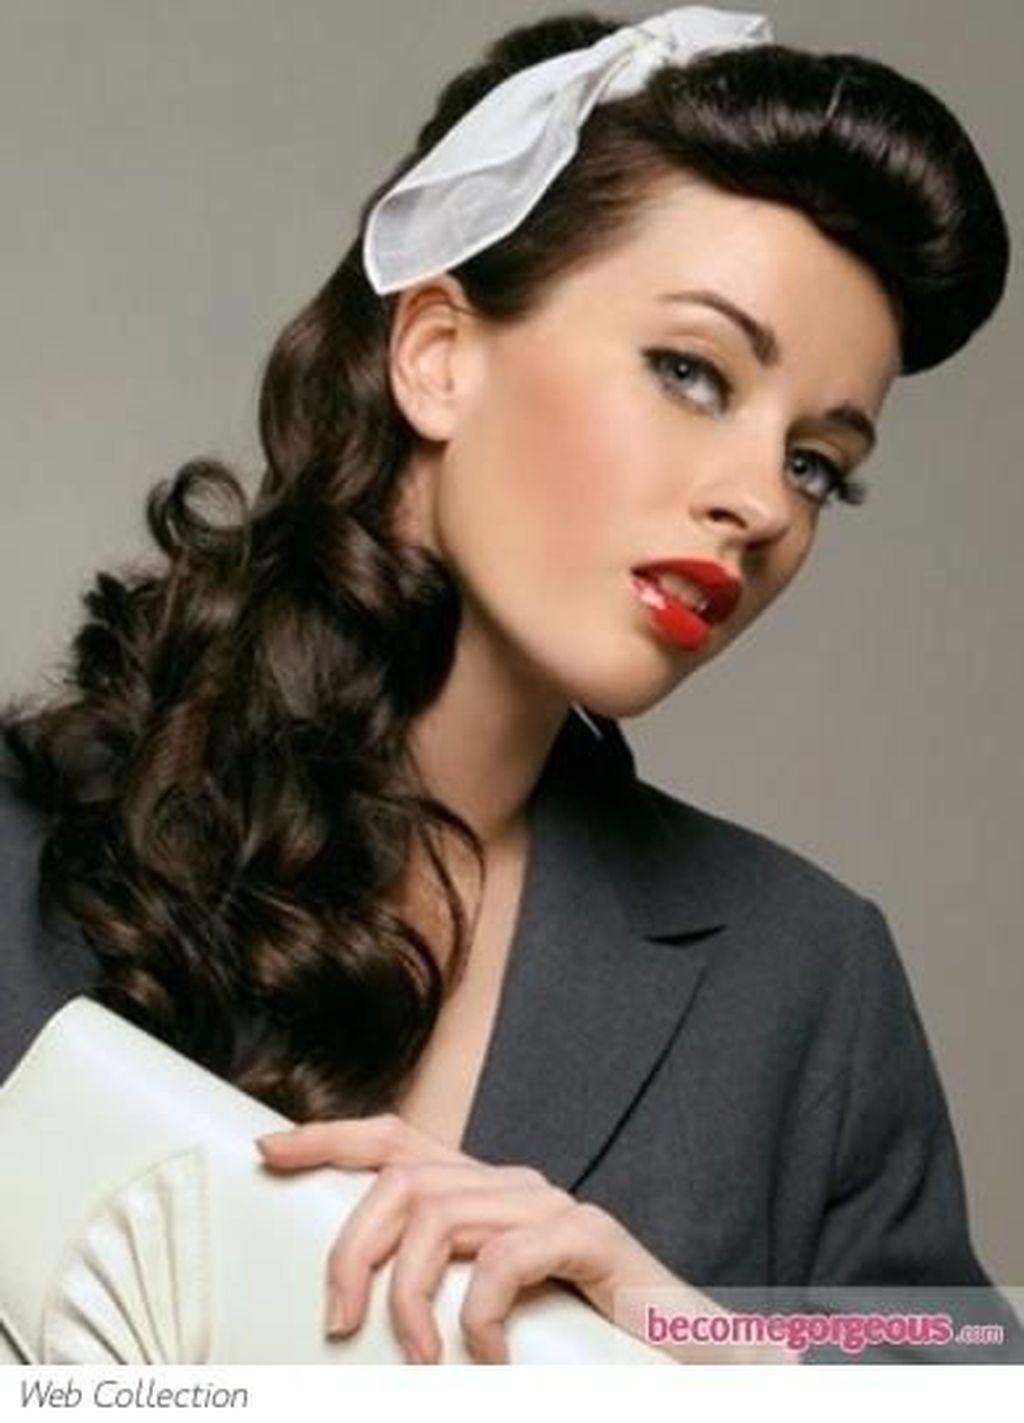 37 Inspiring 1950s Womens Hairstyles Ideas Addicfashion Vintage Hairstyles For Long Hair Hair Styles Retro Hairstyles